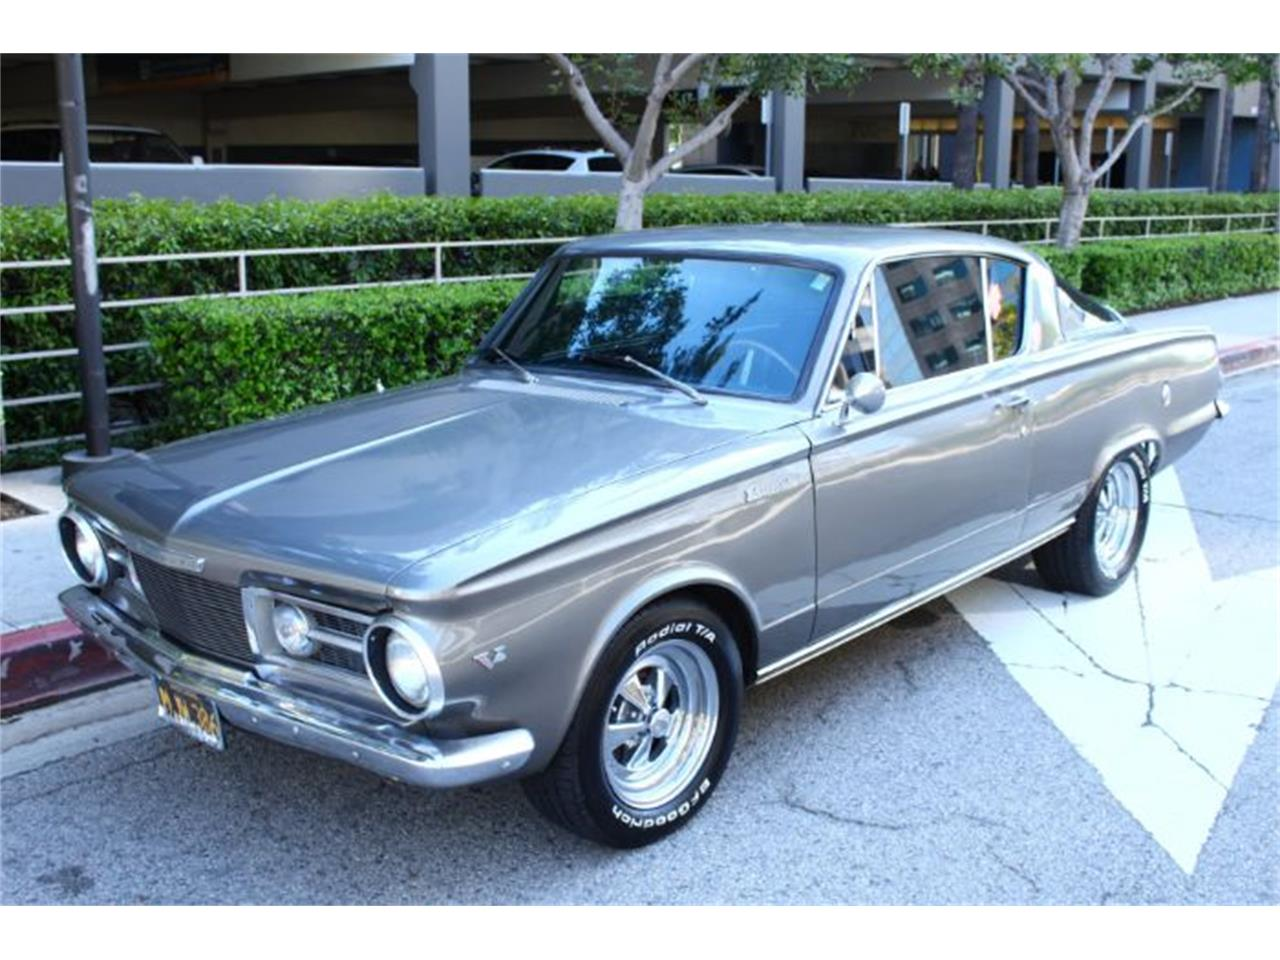 For Sale: 1965 Plymouth Barracuda in Cadillac, Michigan